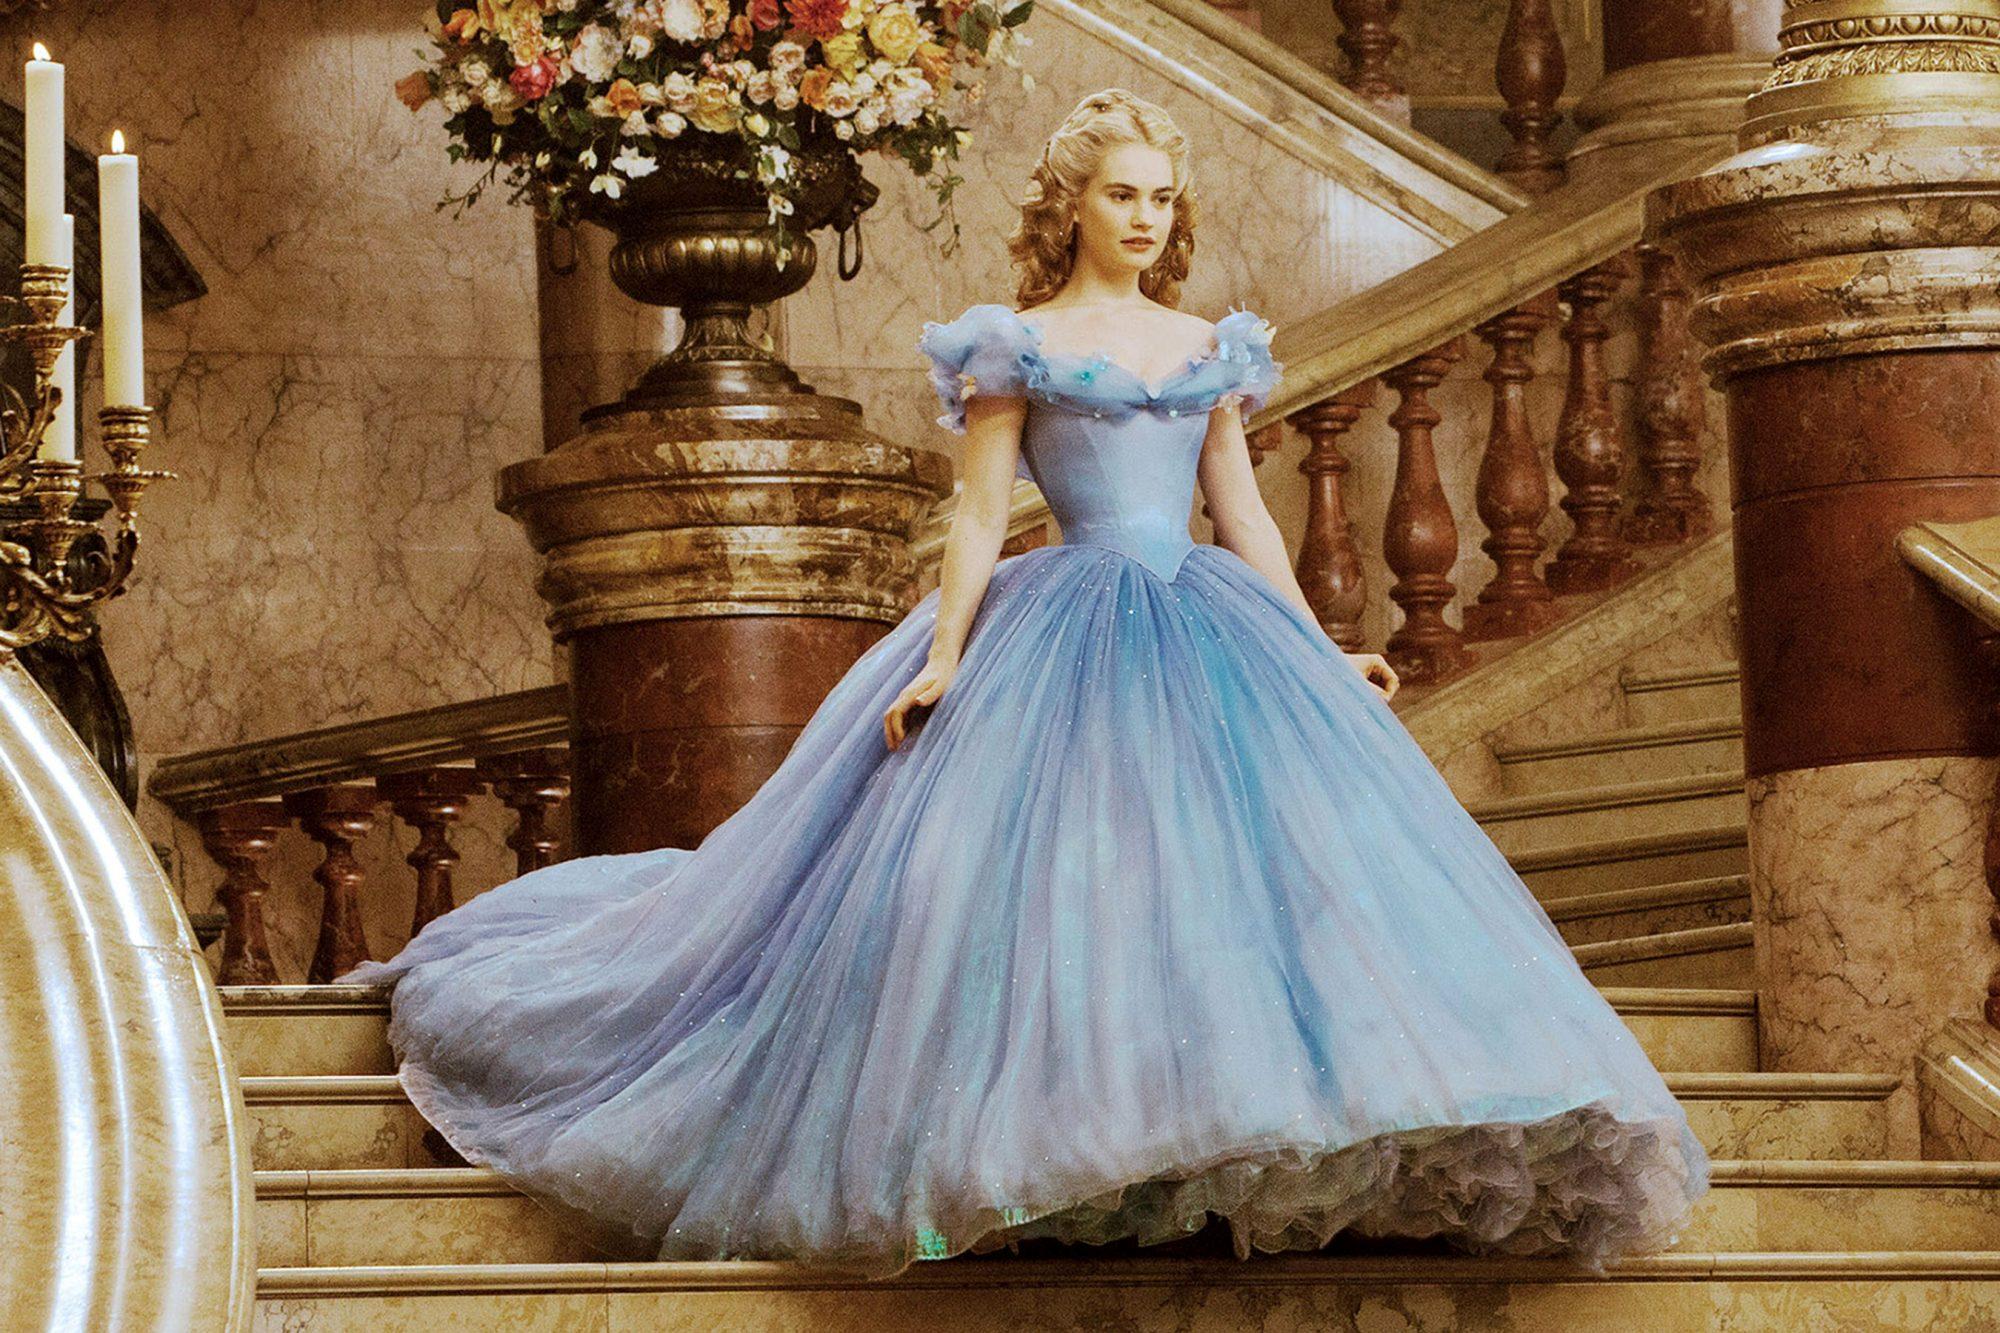 CINDERELLA, Lily James as Cinderella, 2015. ph: Jonathan Olley/©Walt Disney Studios Motion